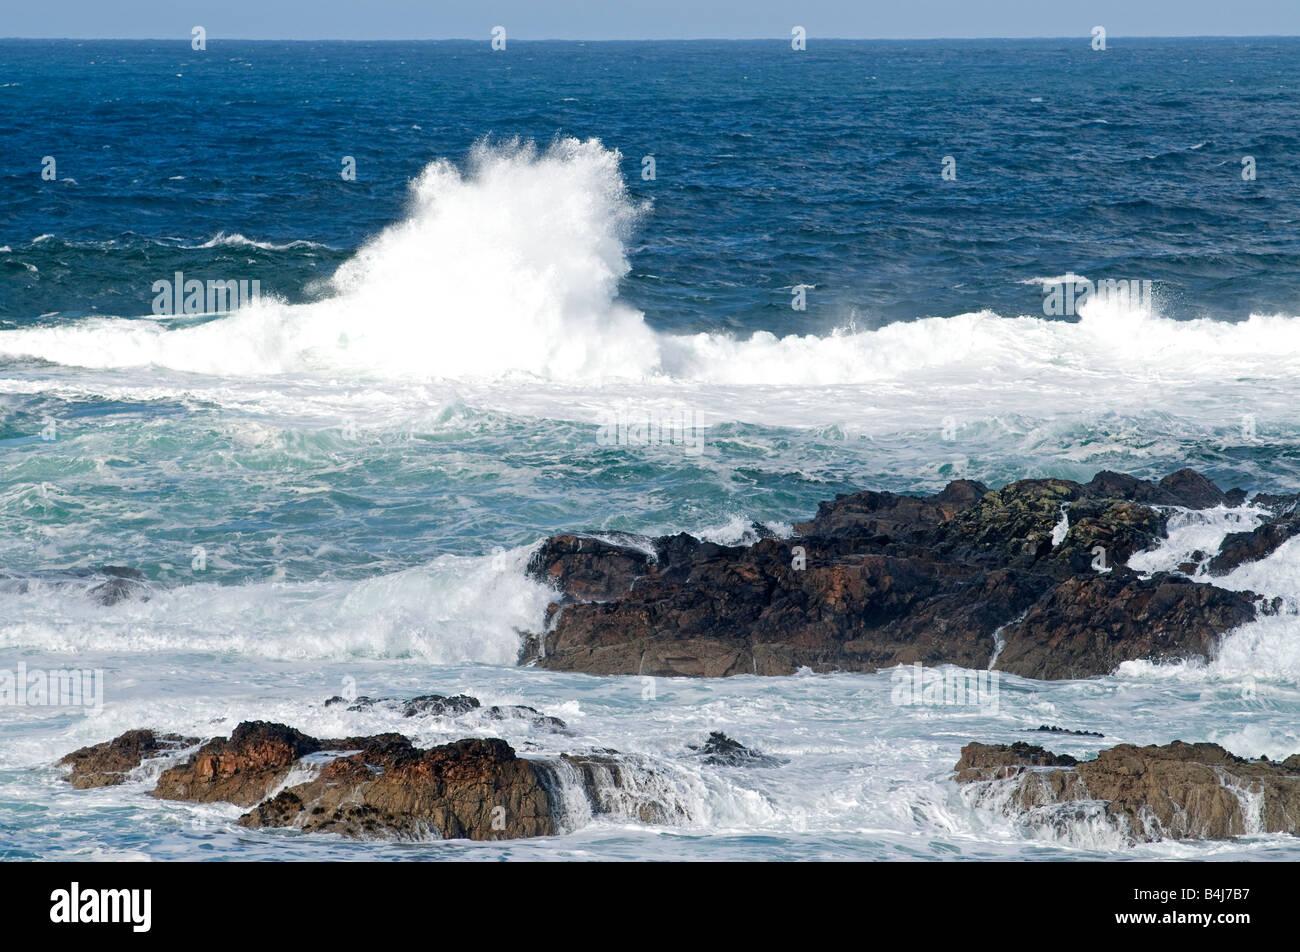 Rough Sea on the Pentland Firth Caithness Scottish Highlands North Coast UK - Stock Image